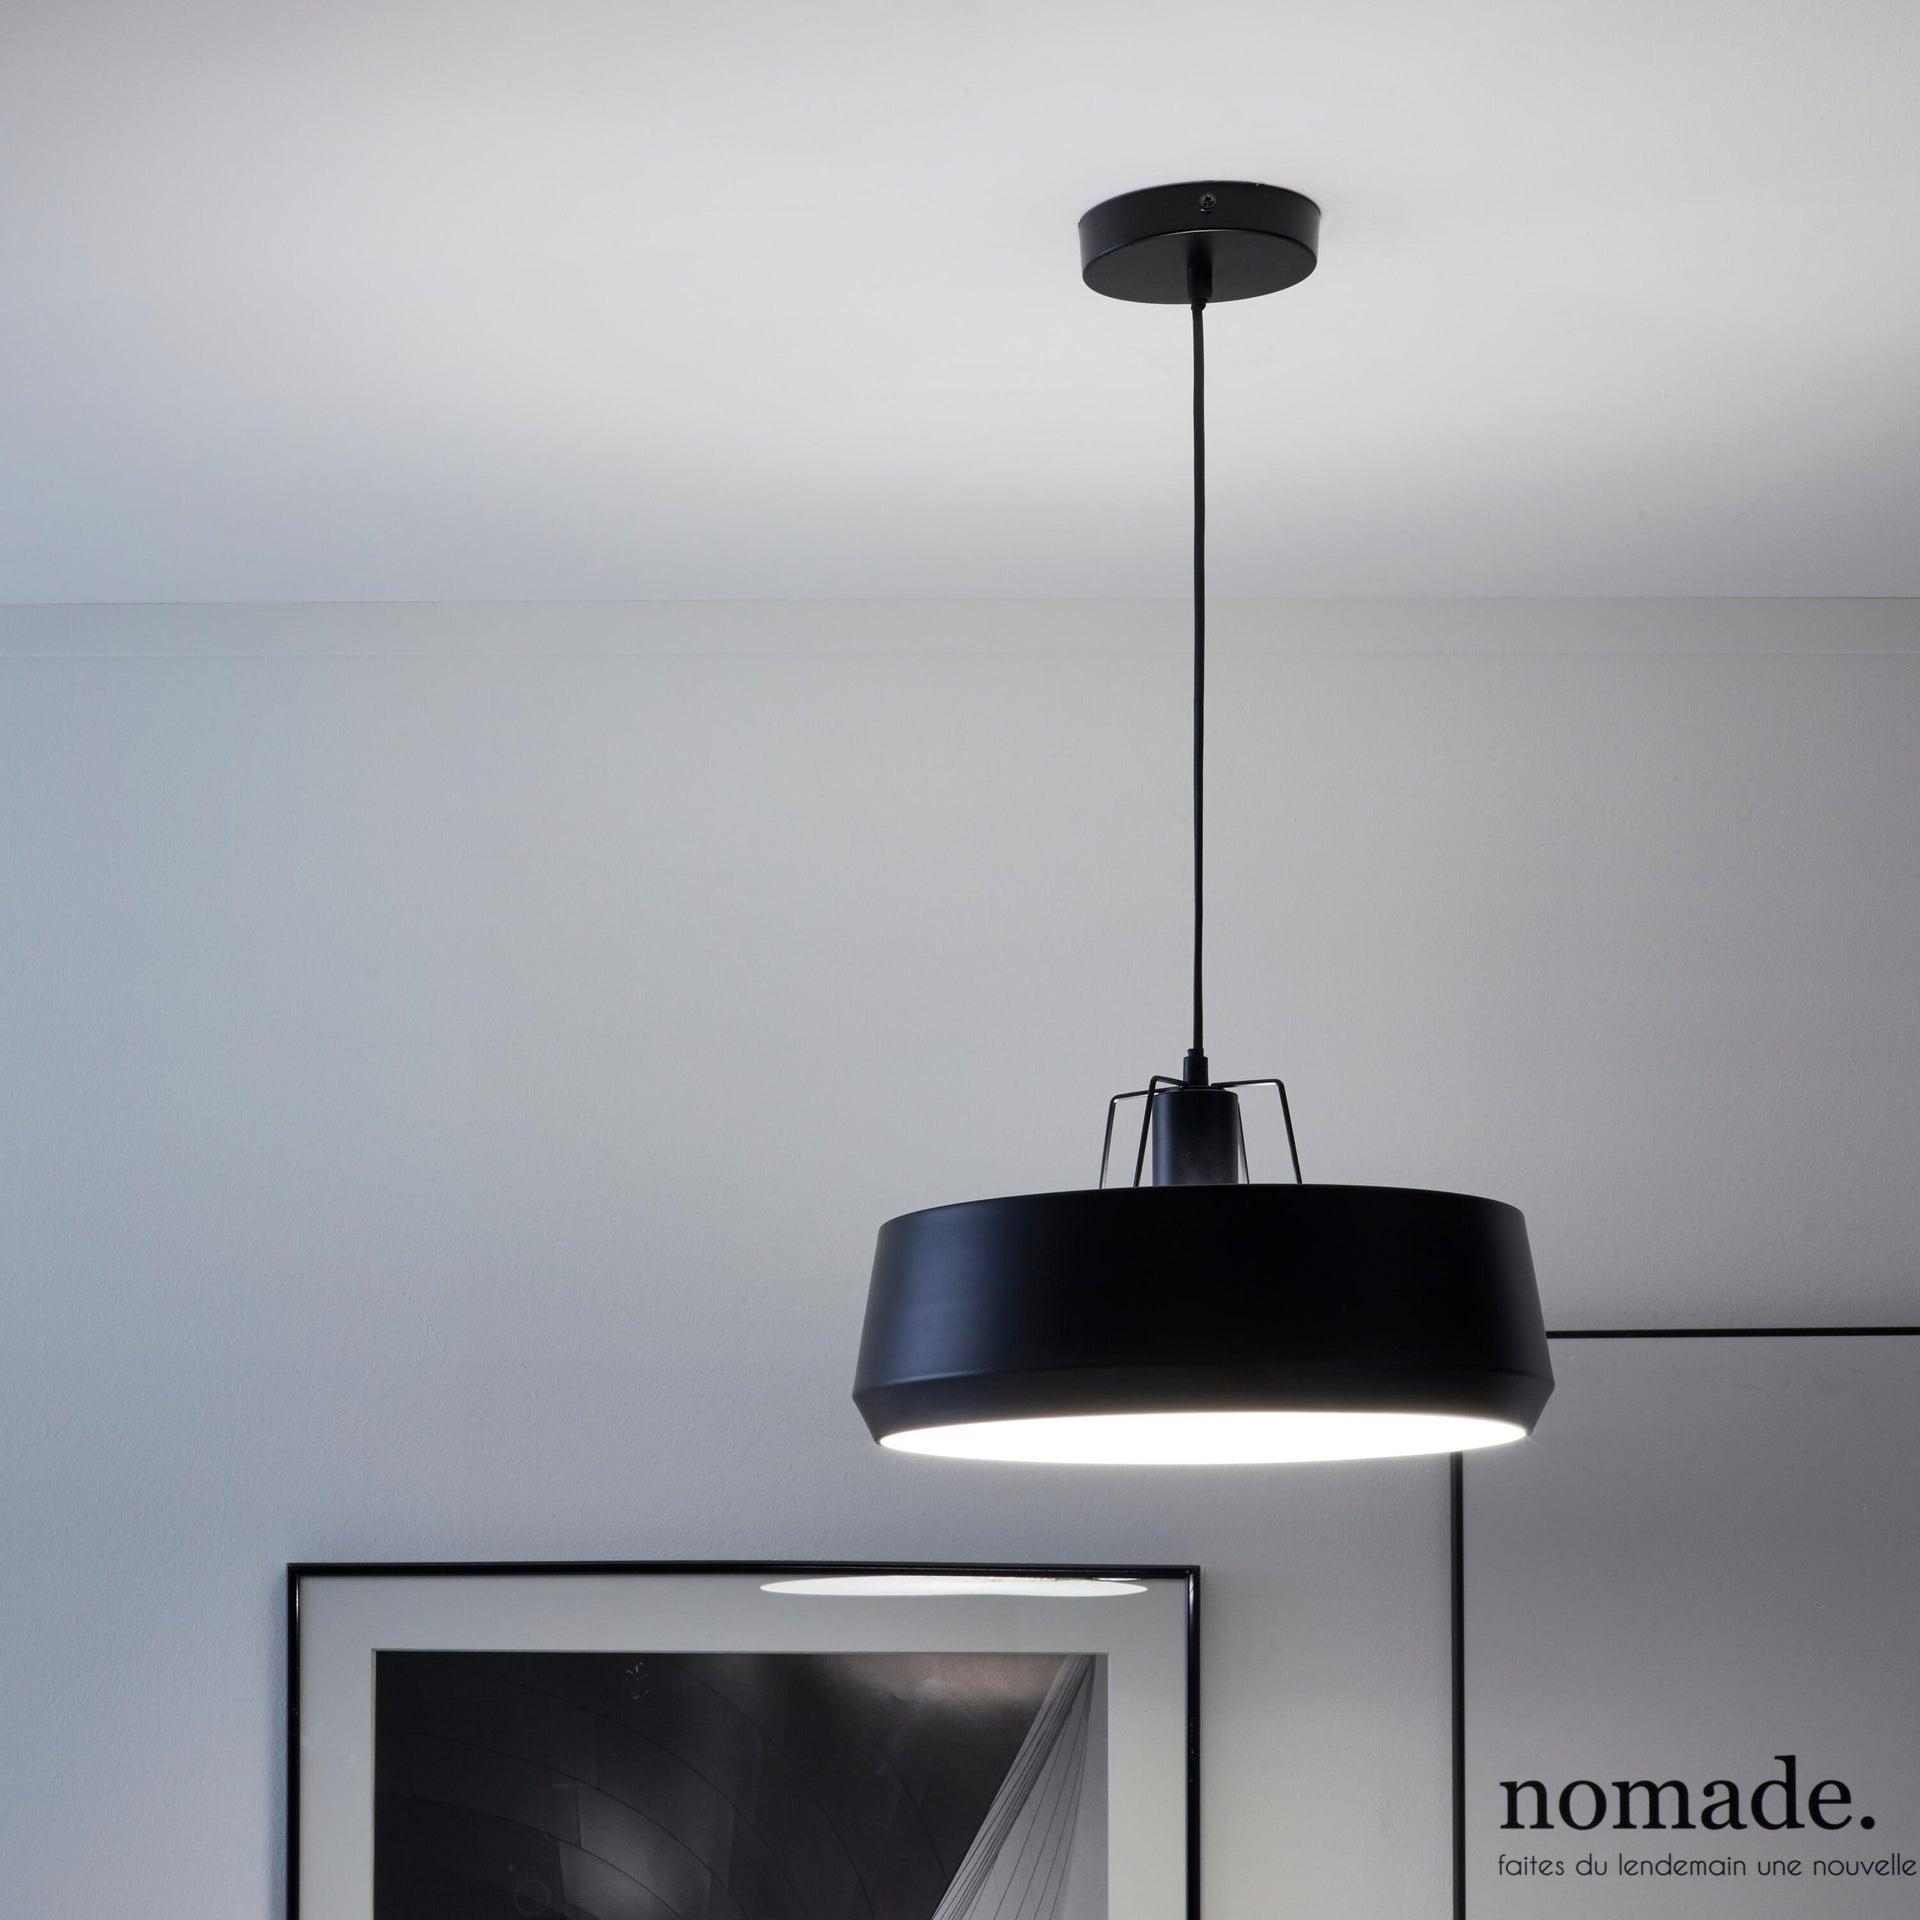 Lampadario Industriale Glint nero in metallo, D. 35 cm, L. 32 cm, INSPIRE - 3